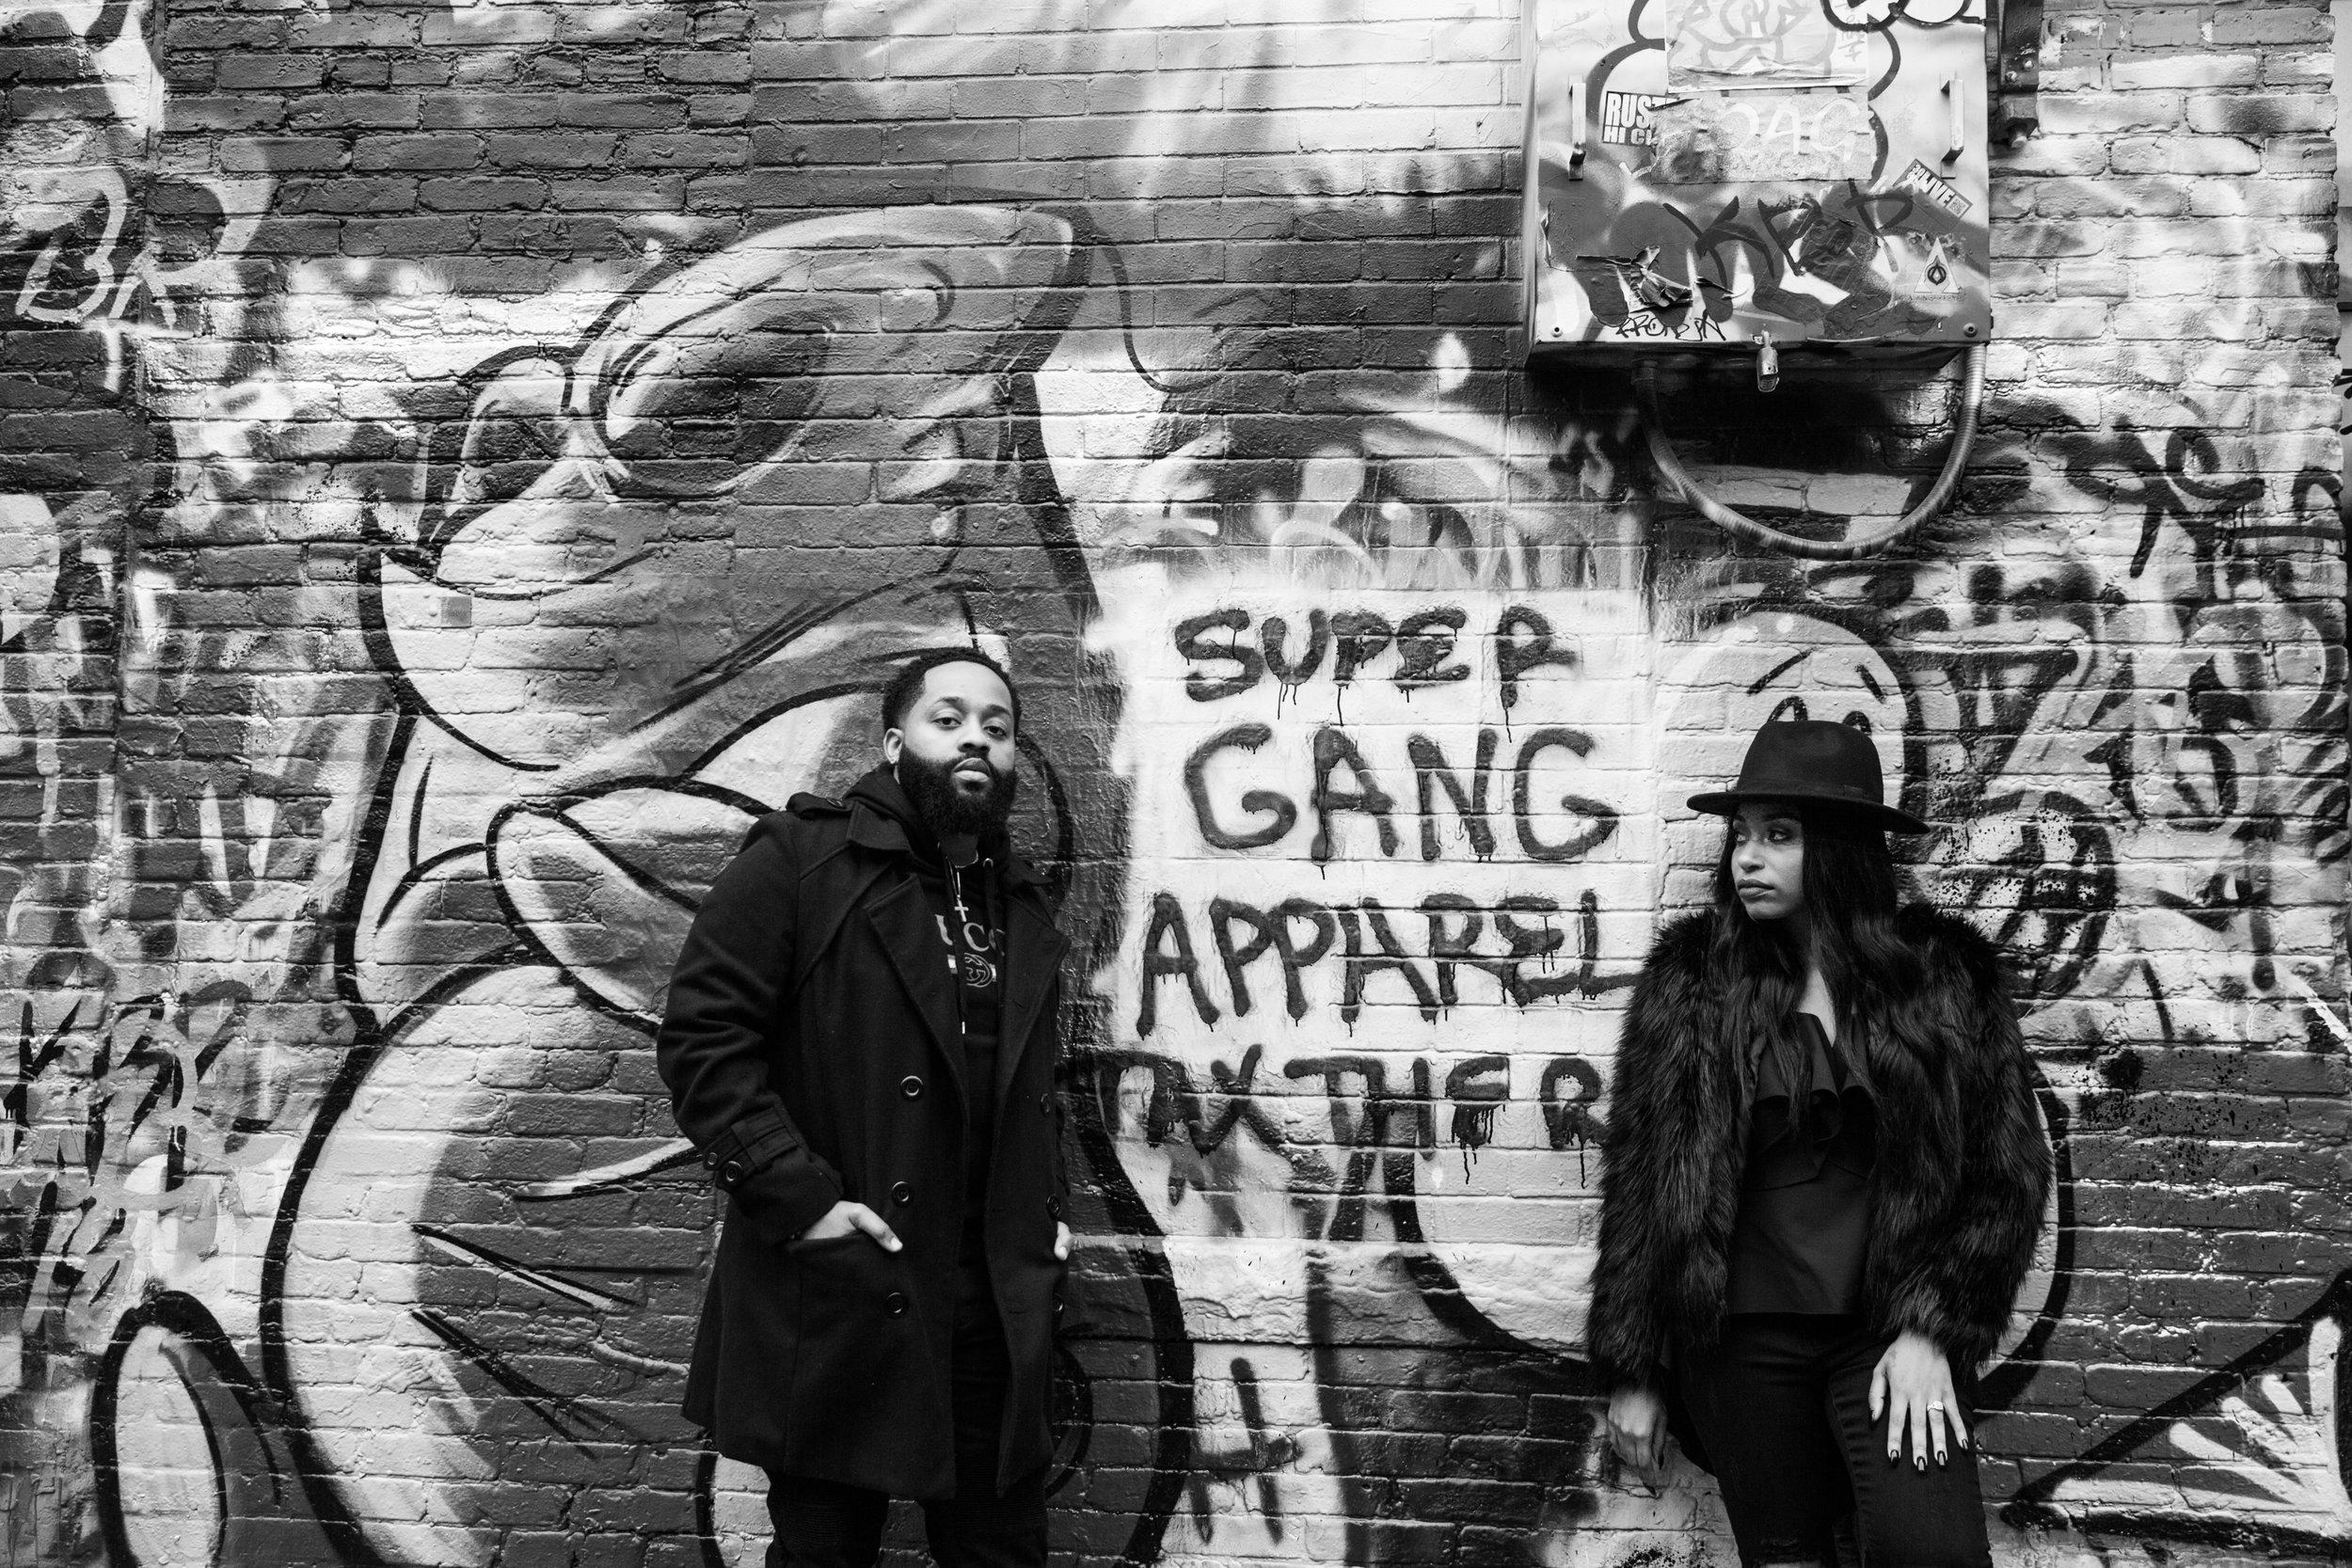 Creative Baltimore Graffiti Alley Engagement Session Megapixels Media Photography-43.jpg